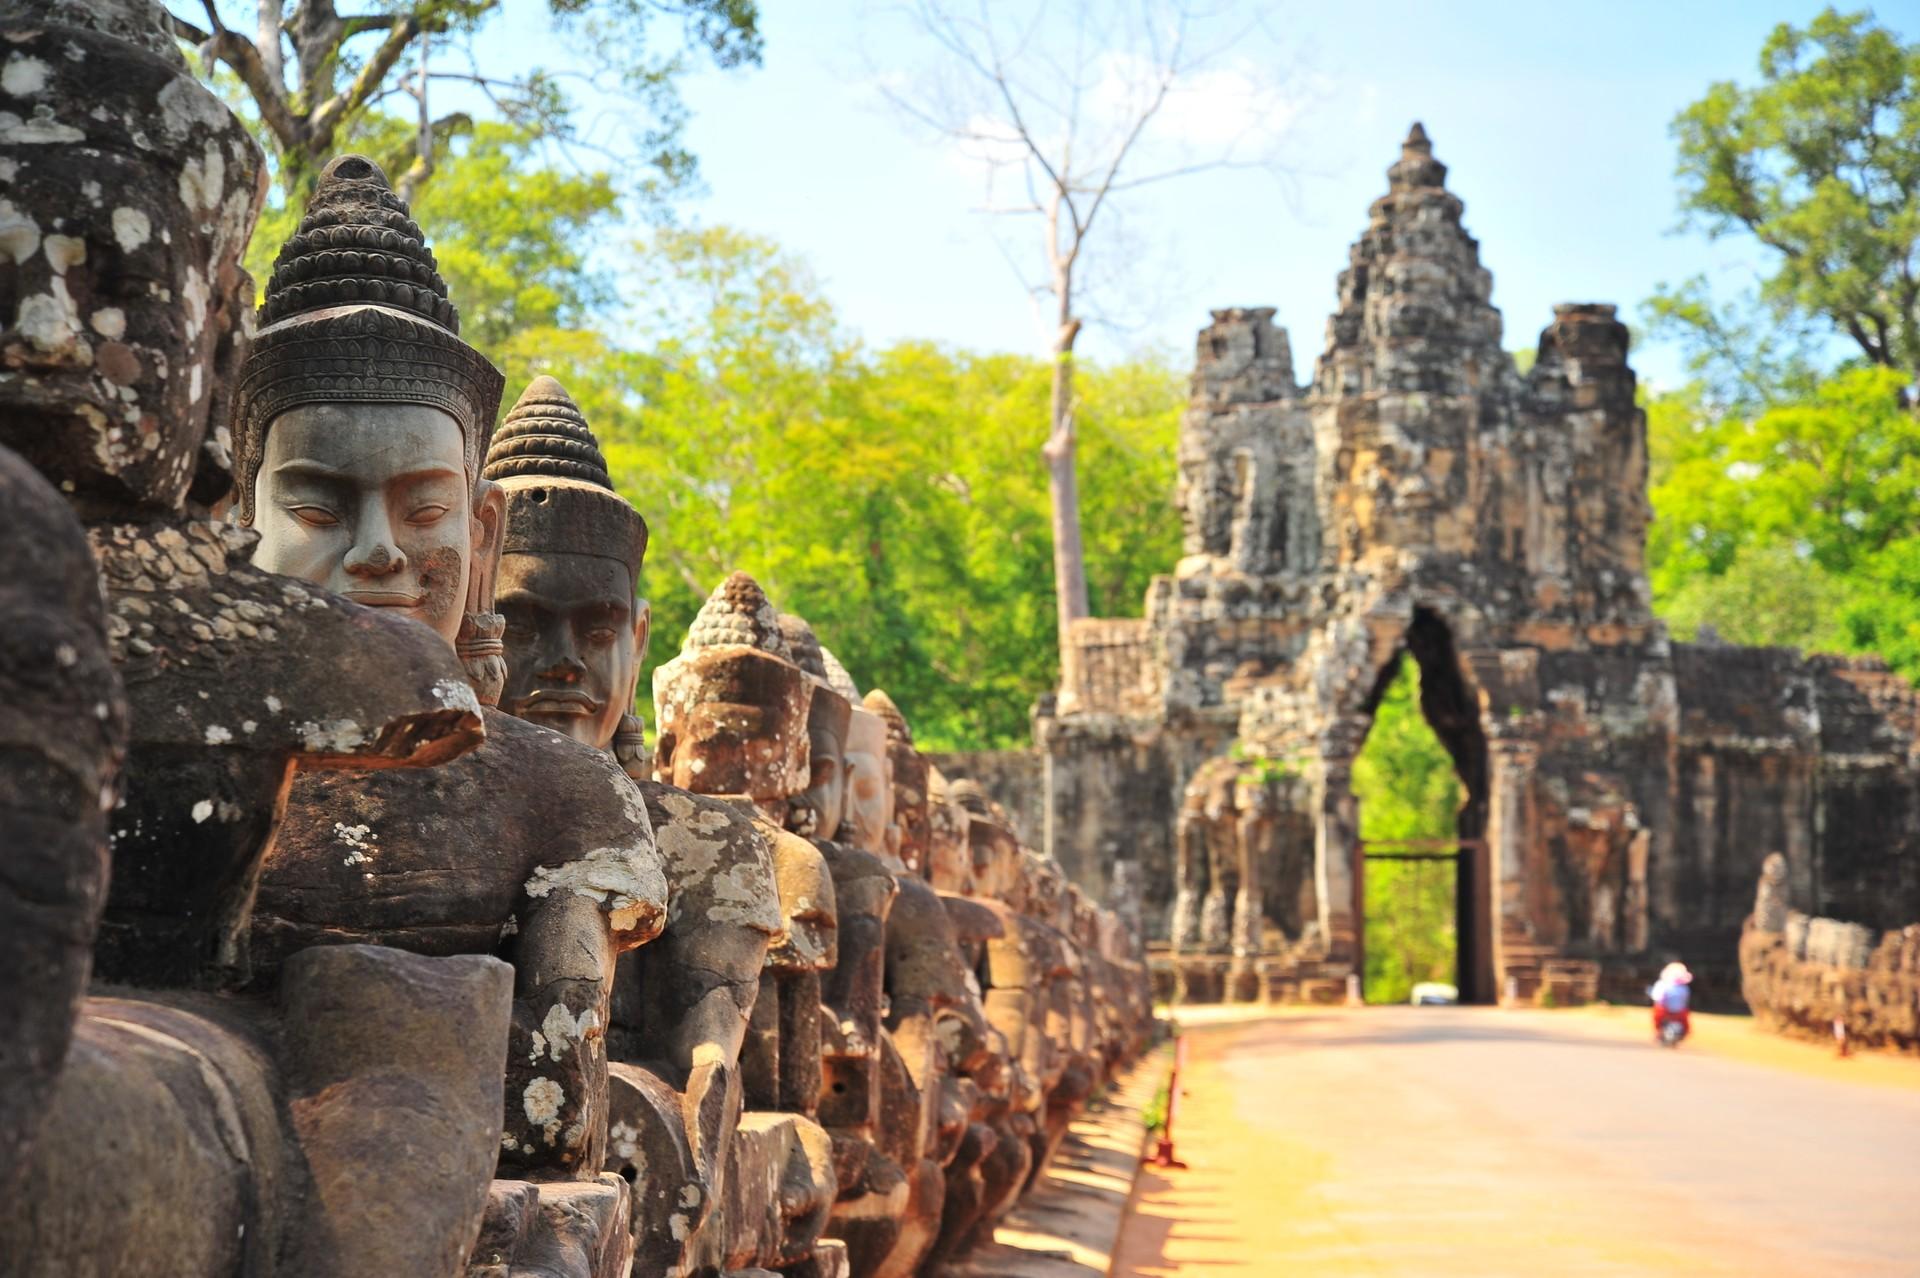 Guardian sculptures outside Angkor Thom gate